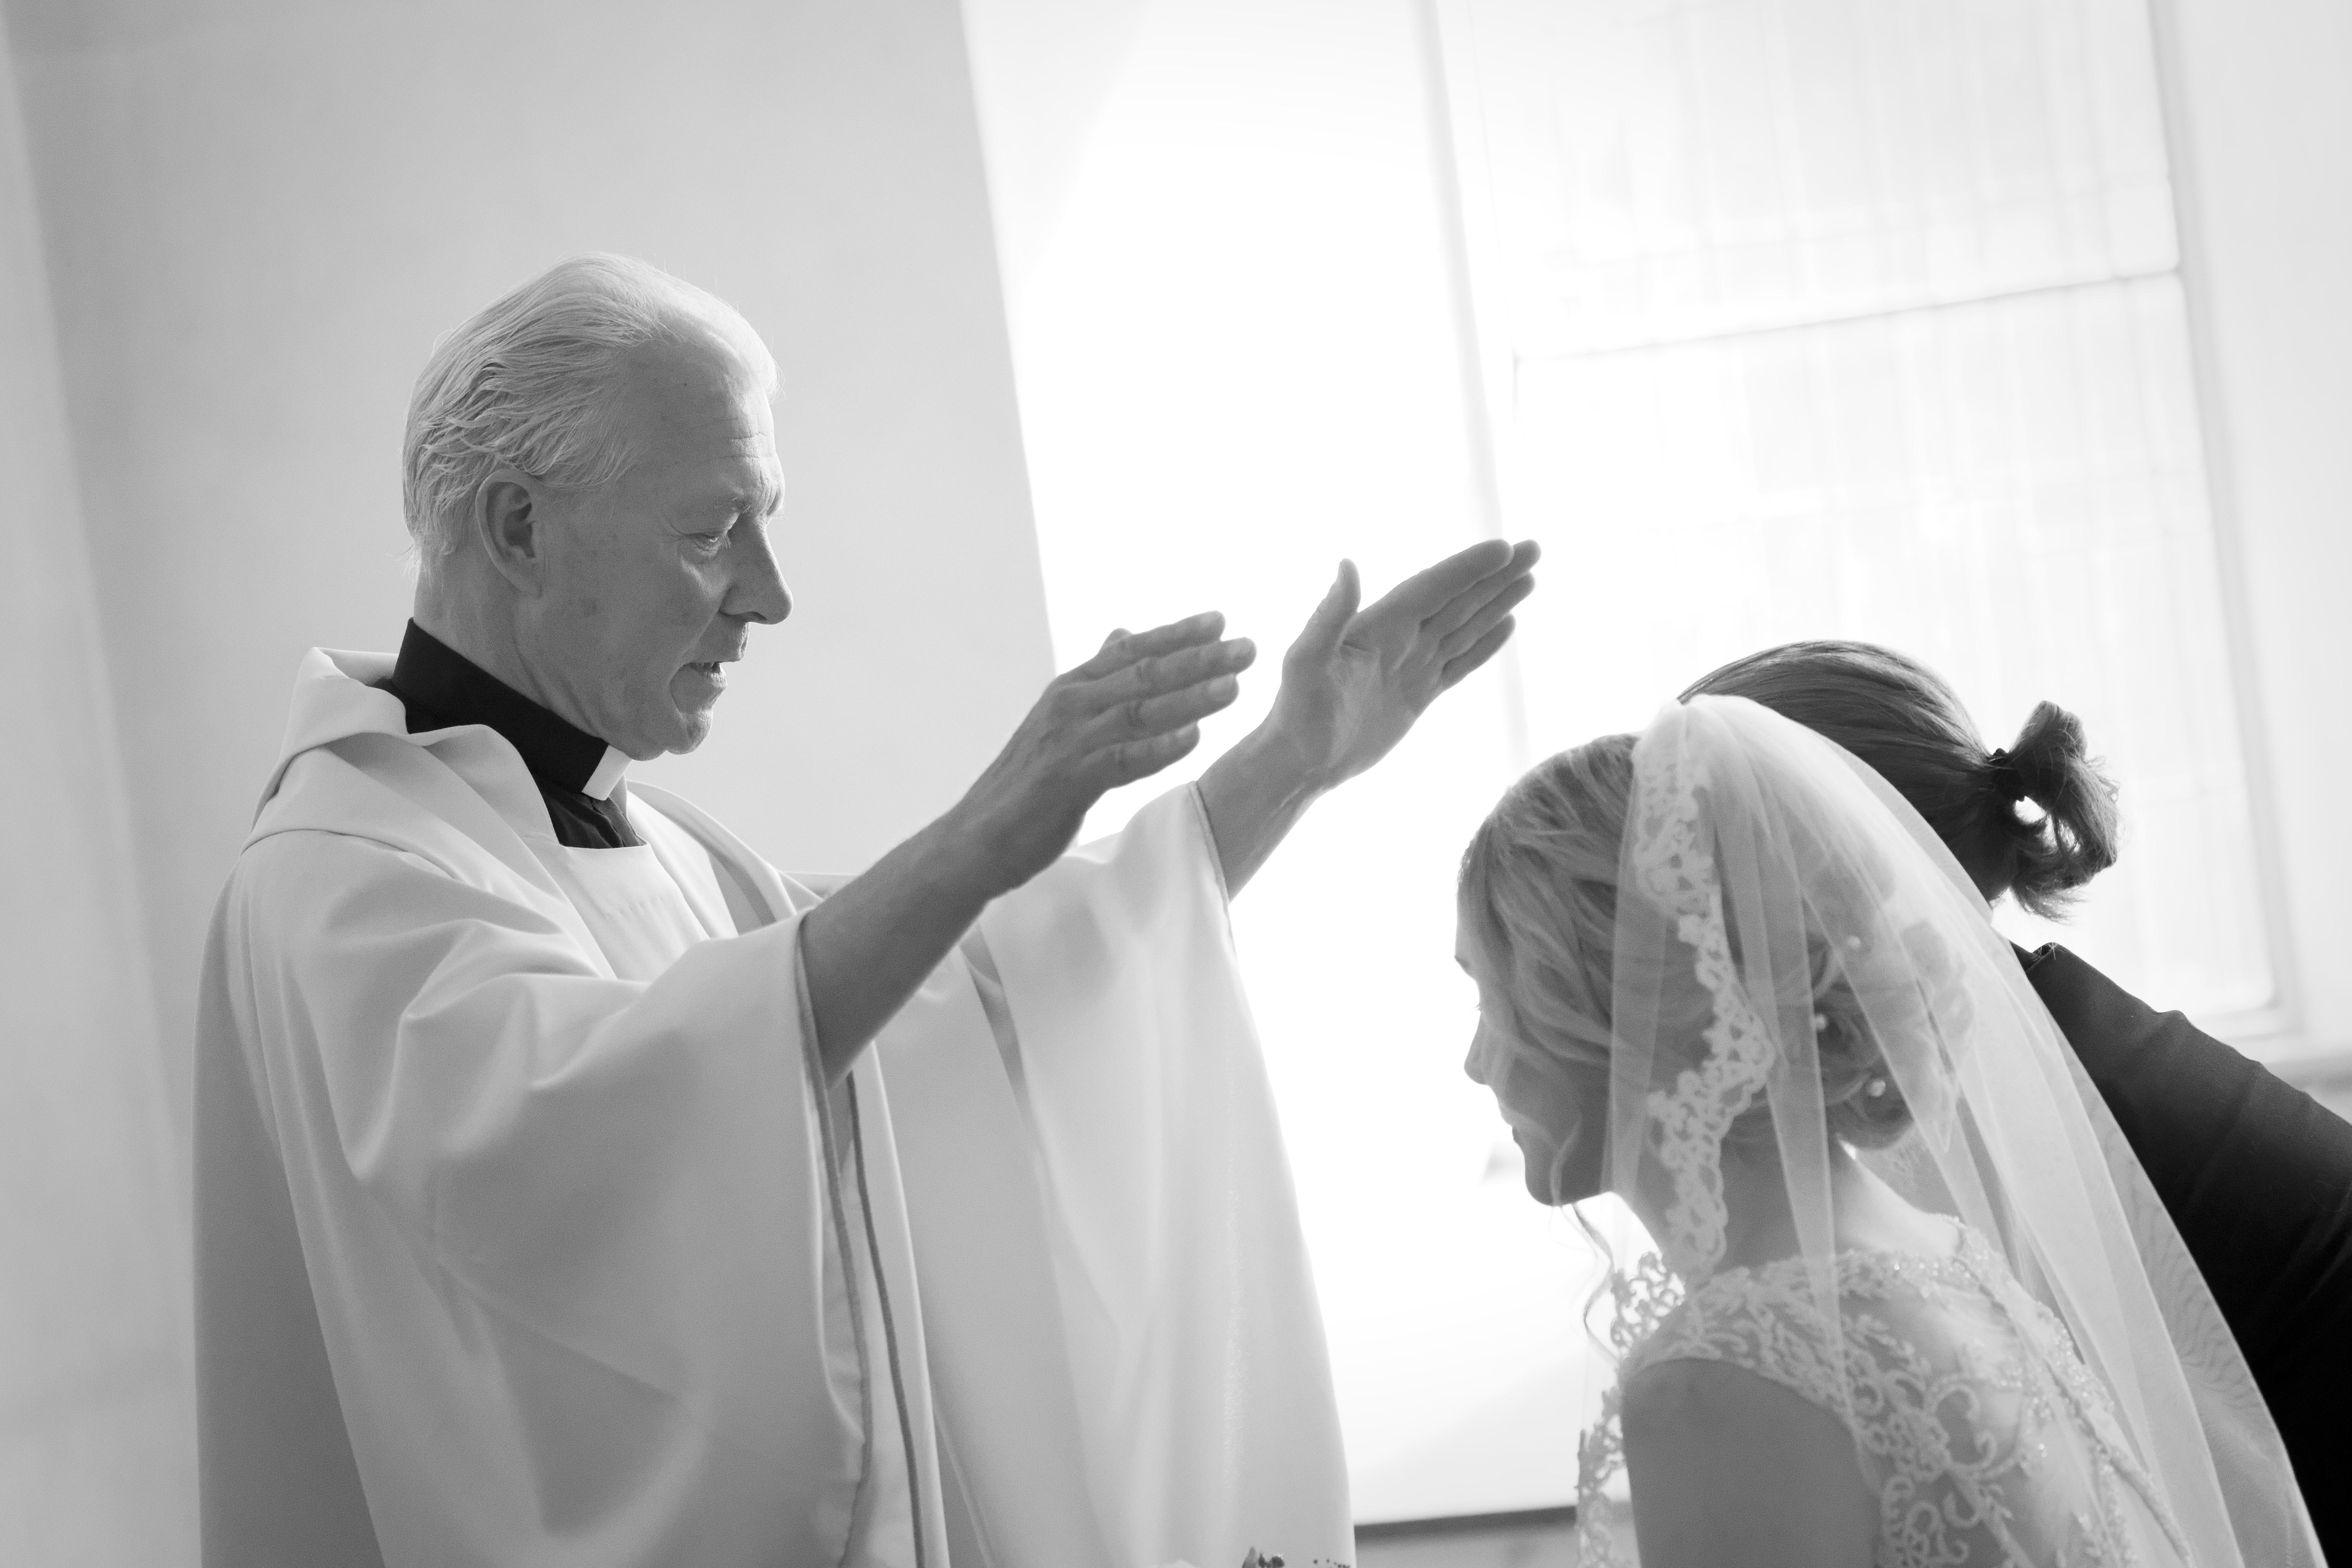 Bröllopsceremoni 4 - välsignelsen